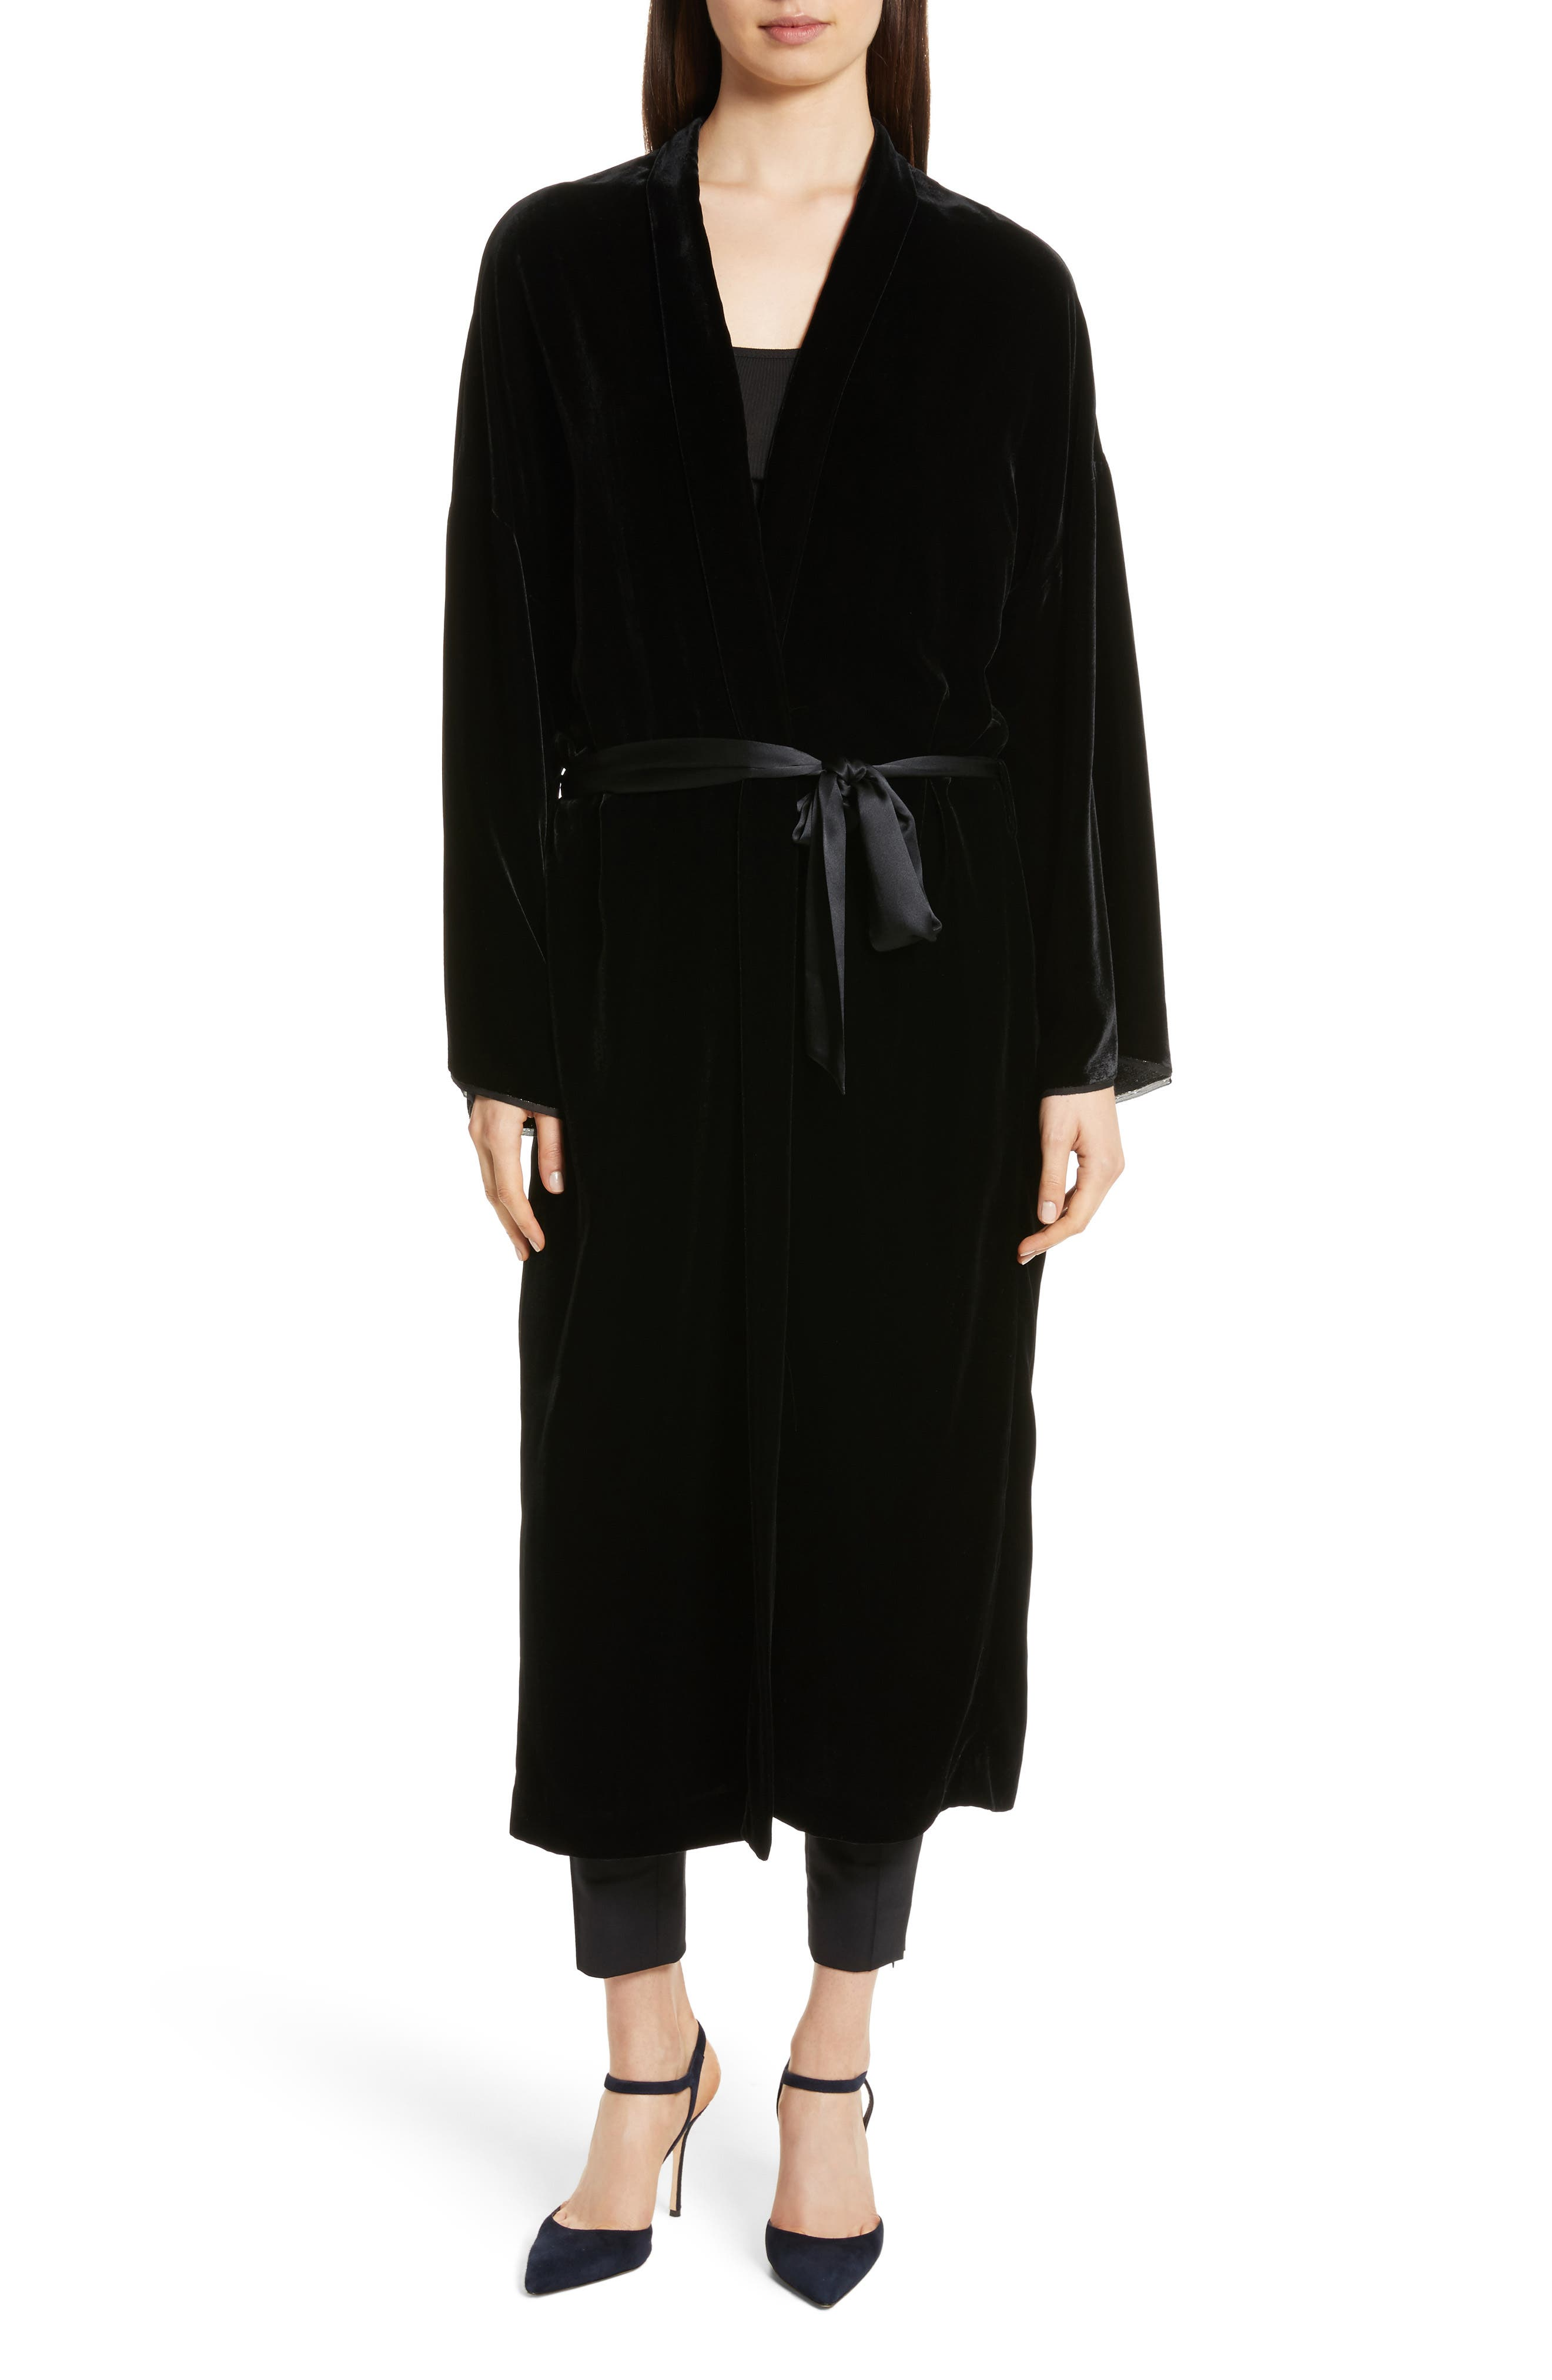 Muna Velvet Kimono,                             Alternate thumbnail 2, color,                             Black